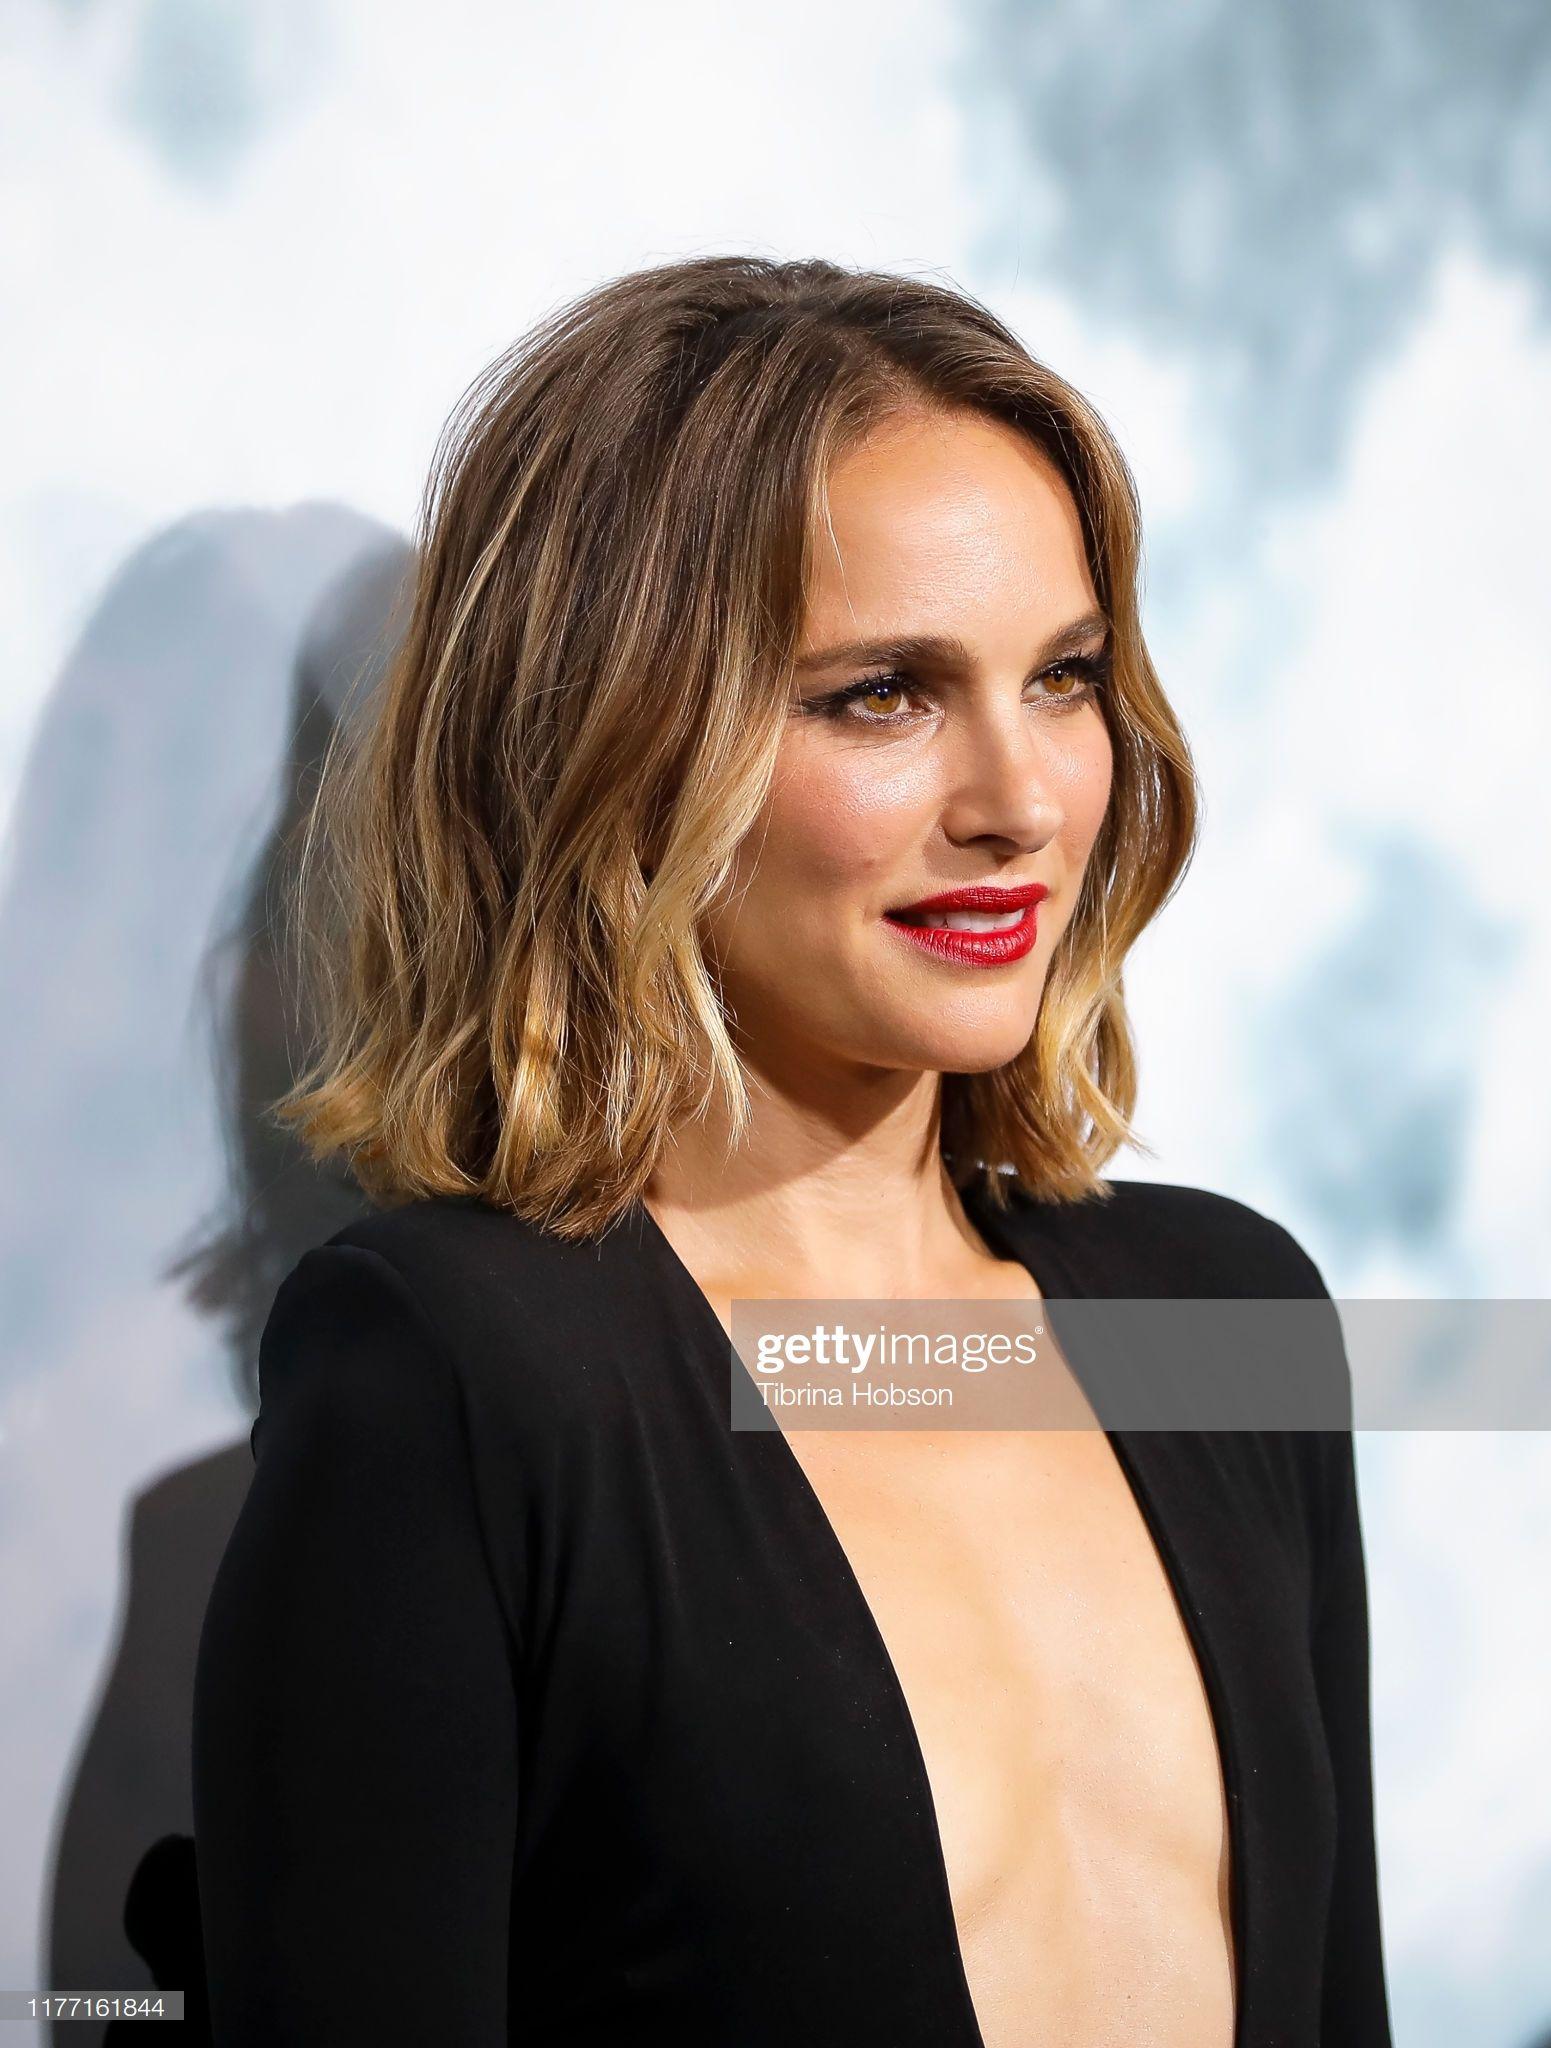 Pin by Jabent on Natalie Portman | Natalie portman, Women